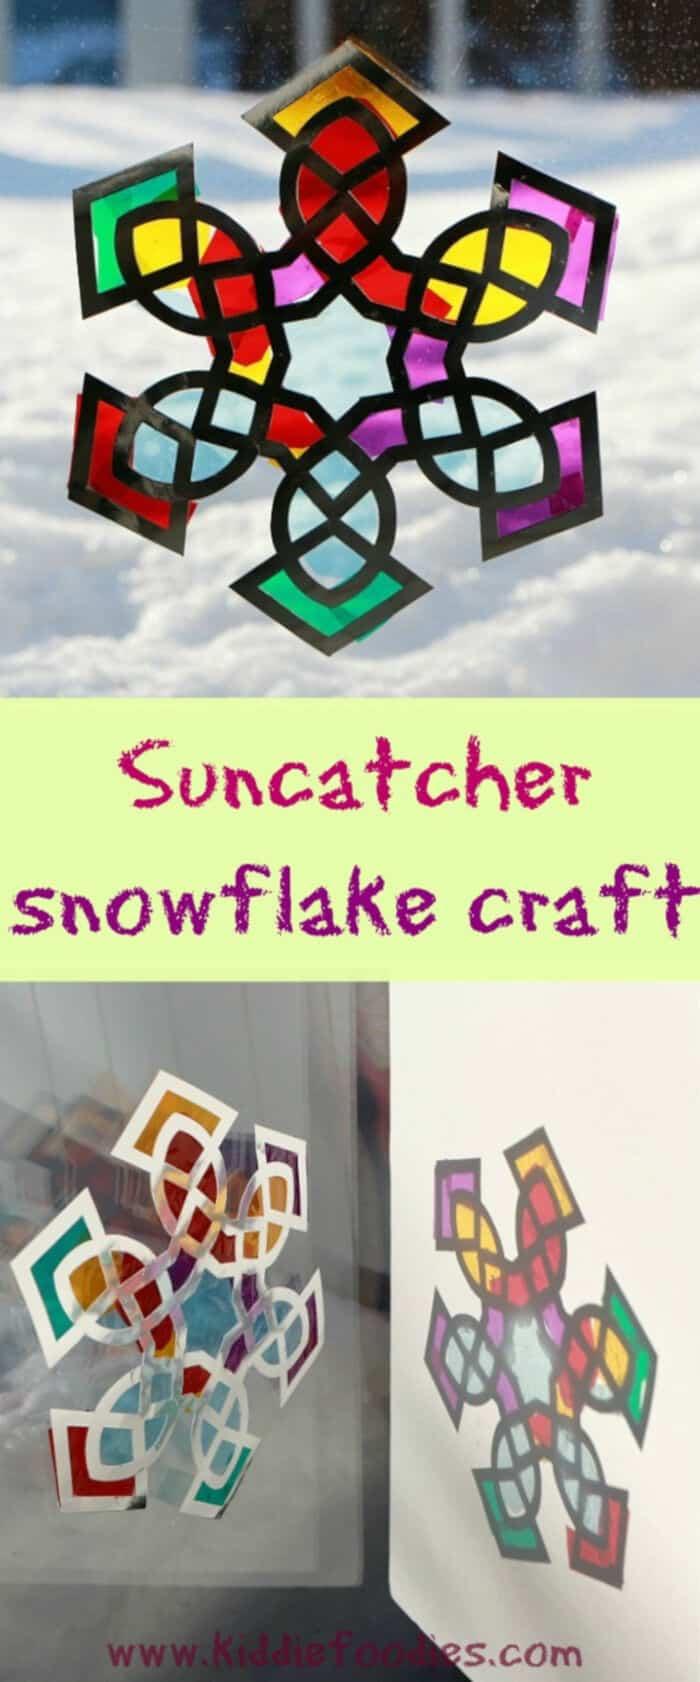 Suncatcher-Snowflake-Craft-by-Kiddie-Foodies